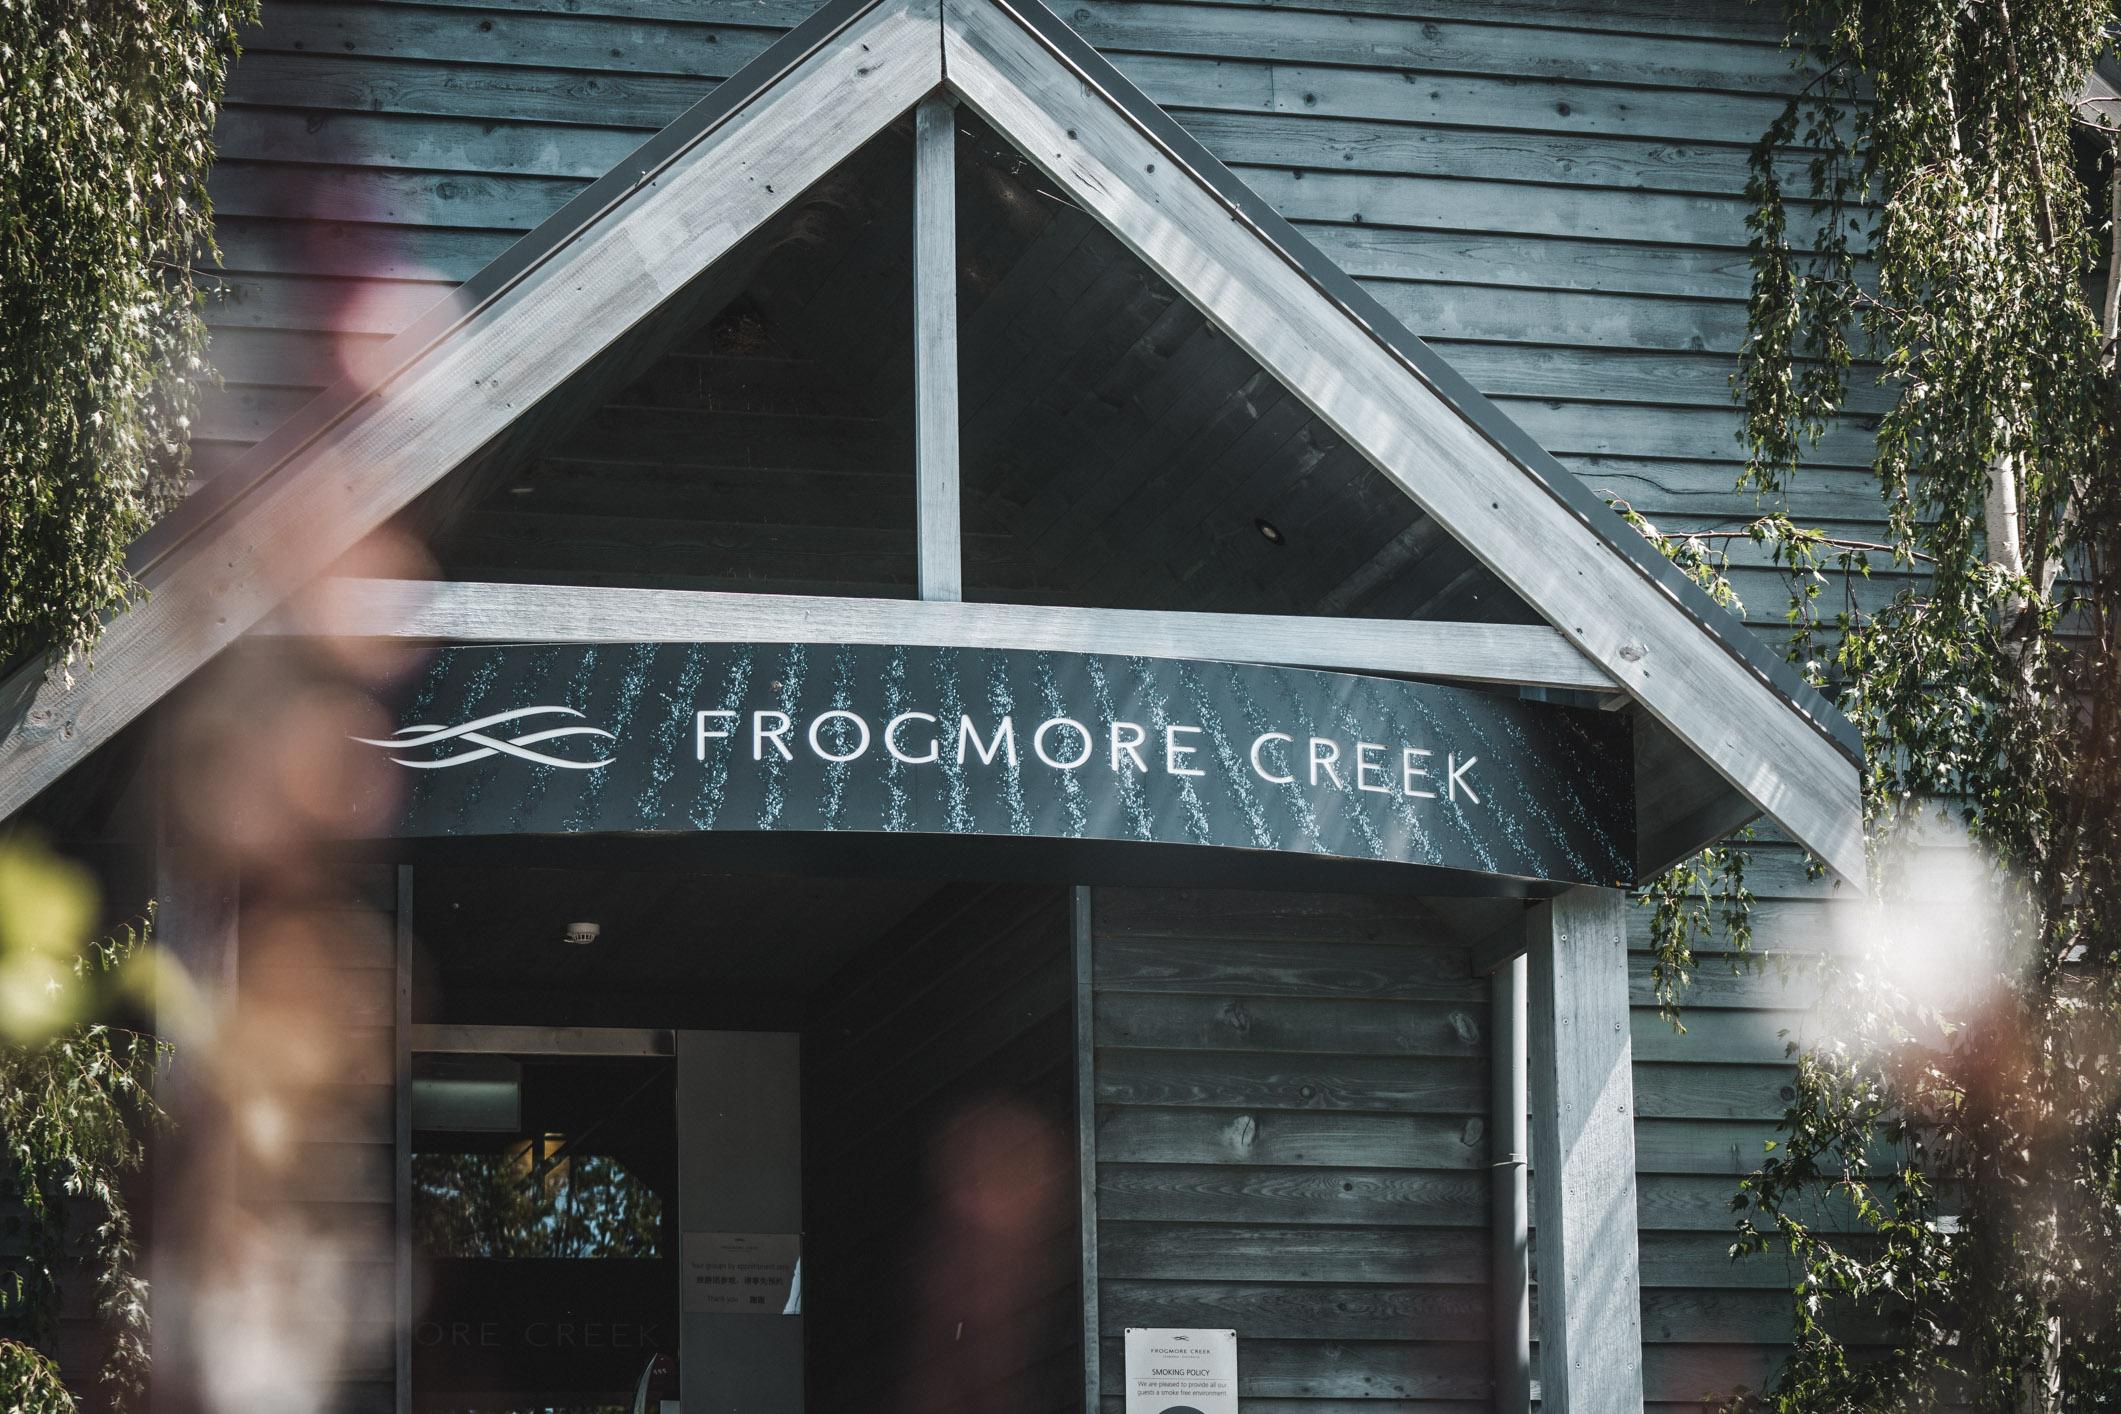 Frogmore Creek (Web) (8 of 8).jpg